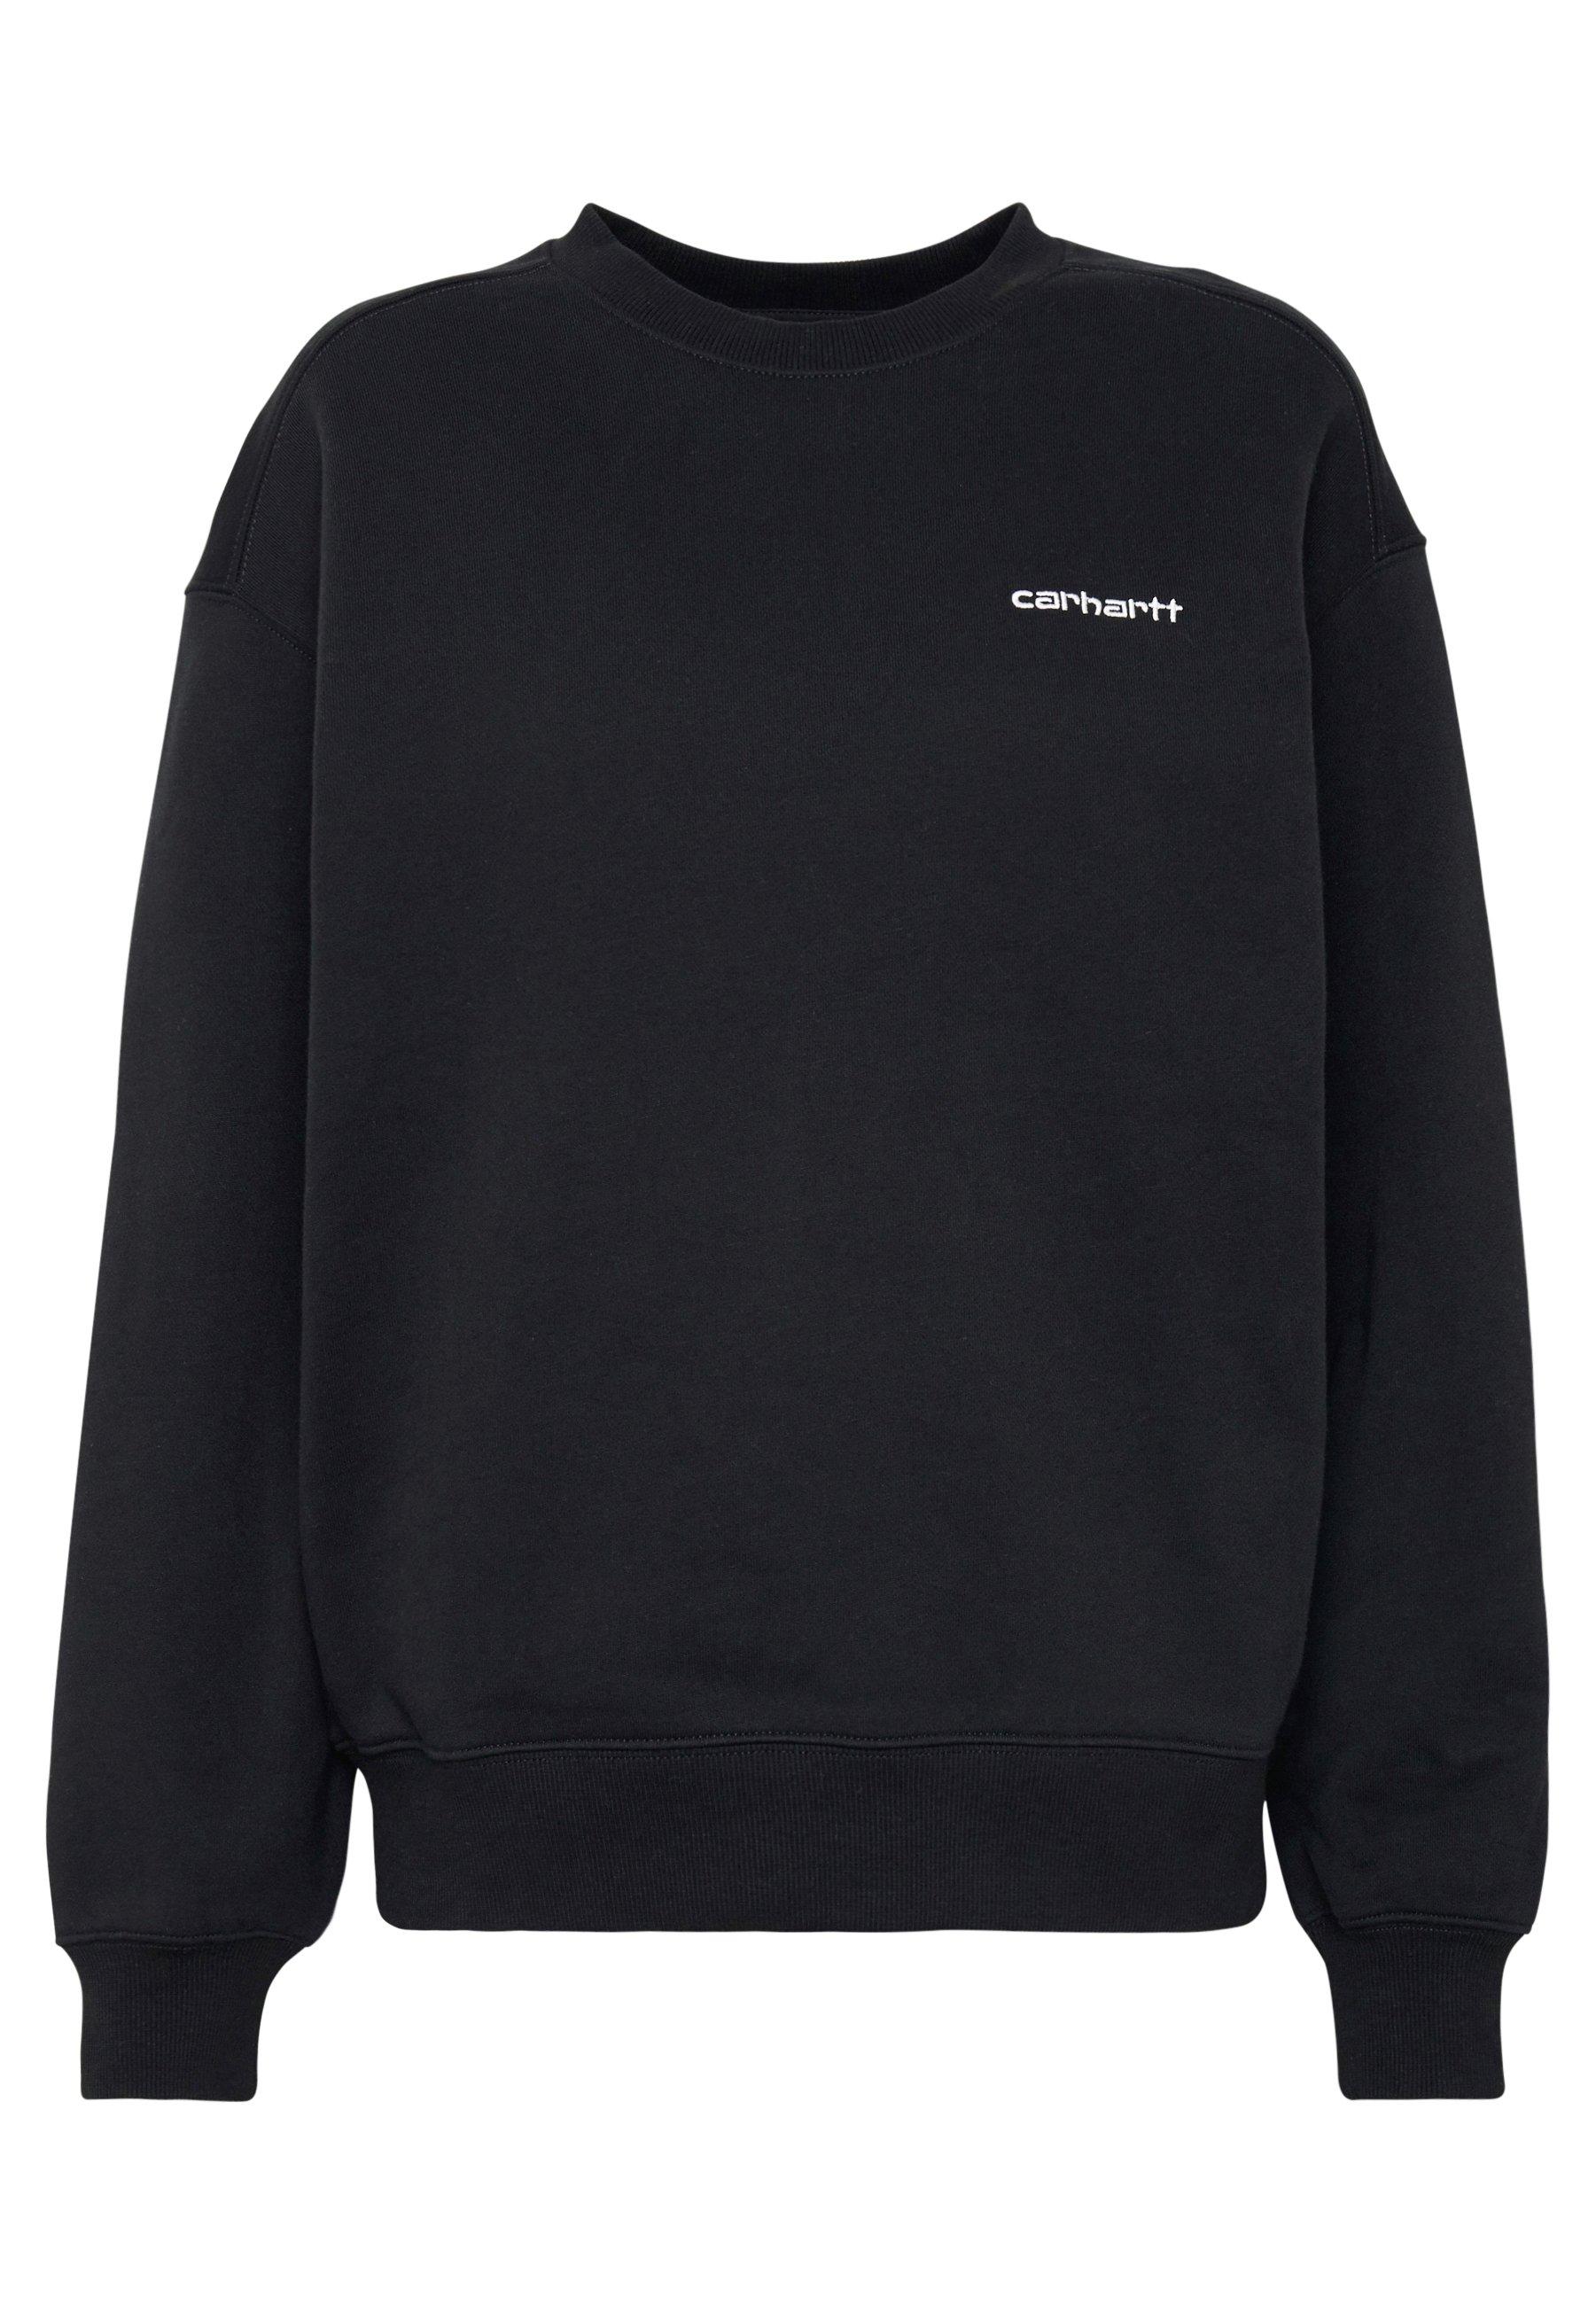 Carhartt Wip Script Embroidery - Sweatshirt Lime/ Black